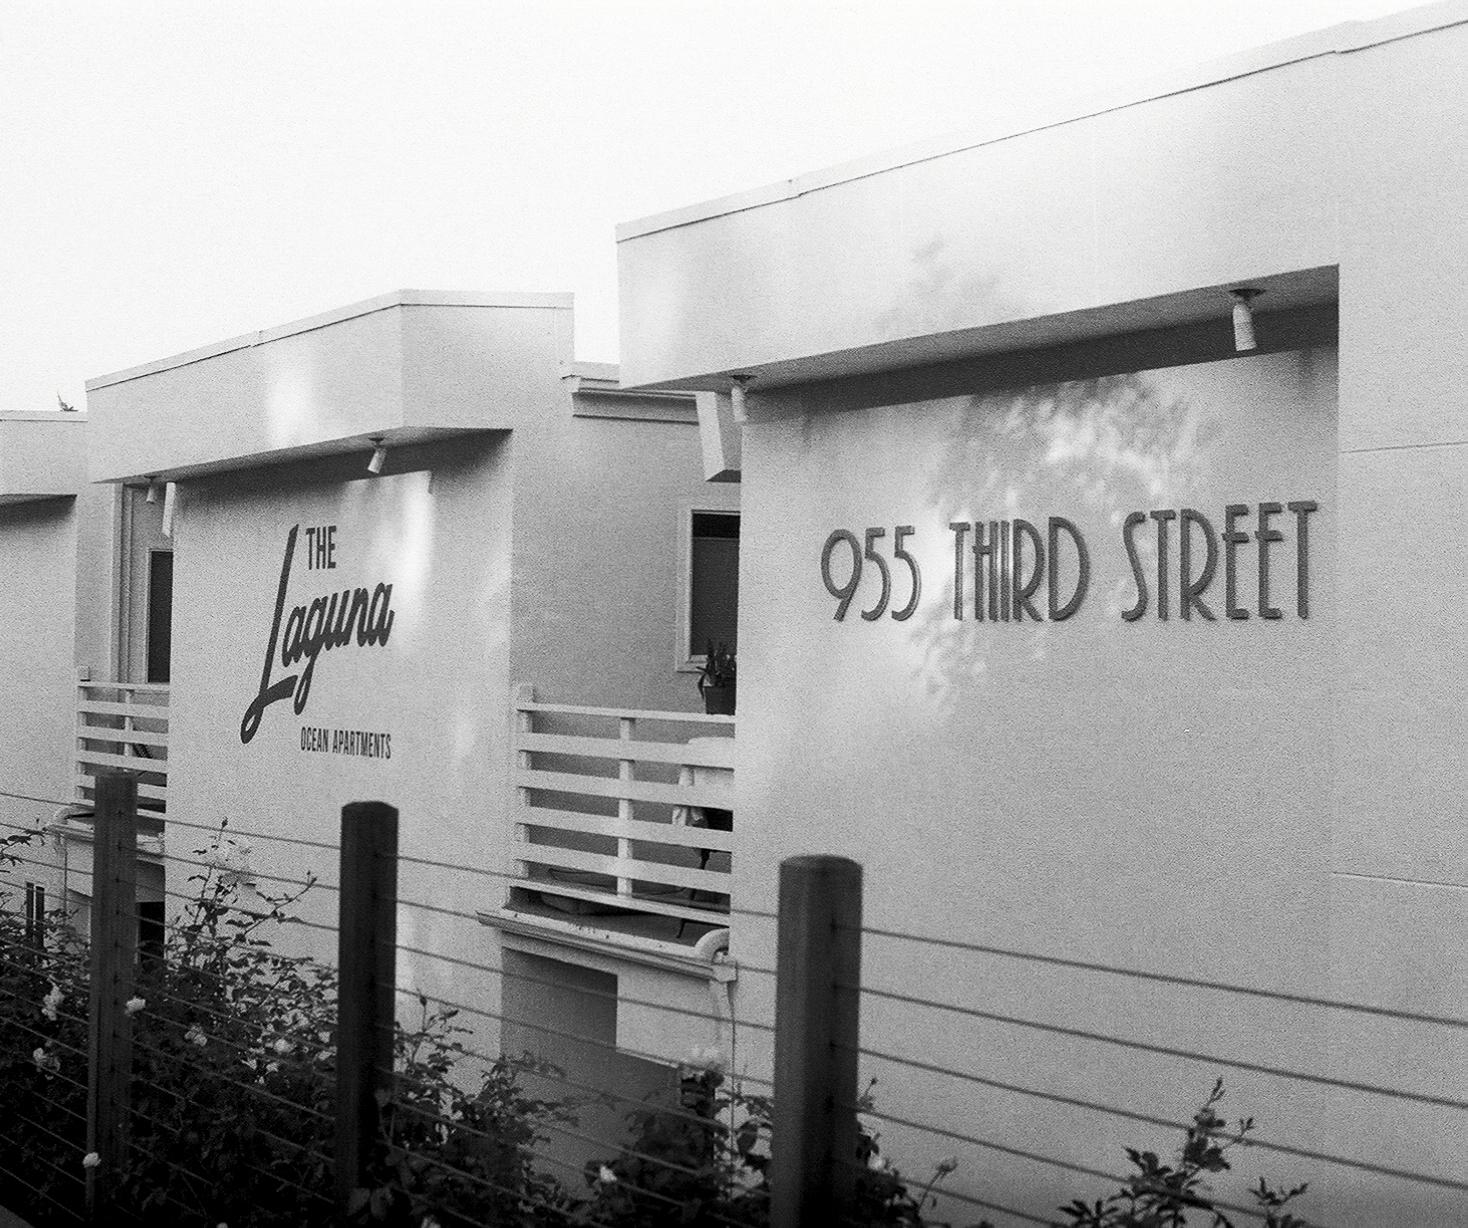 Black and White film photograph of the Laguna Apartments in Encinitas California